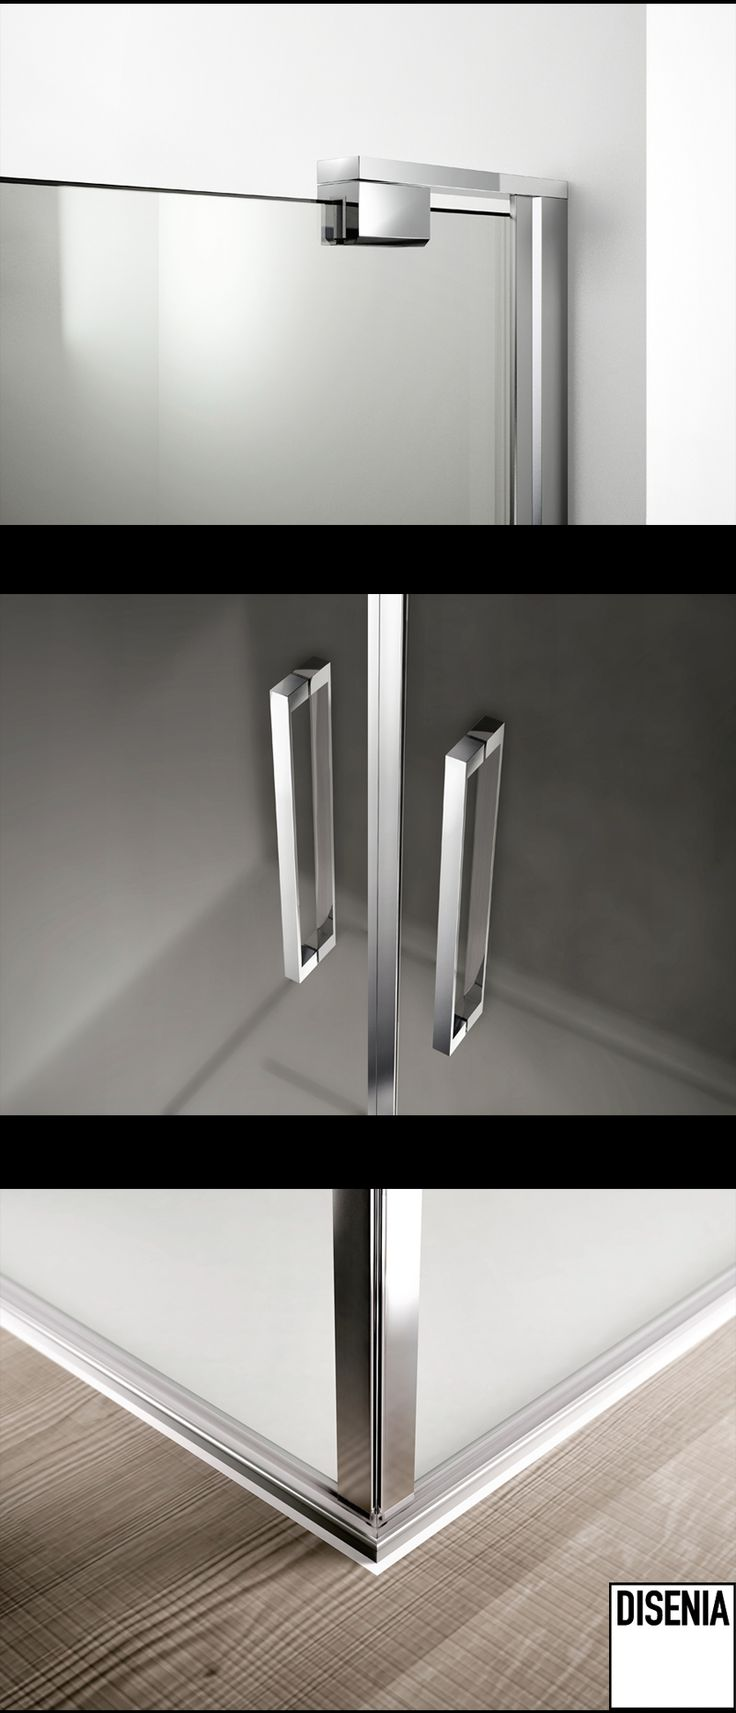 Chromed details of Slim - Disenia Shower Collection #Ideagroup #Bath #Design